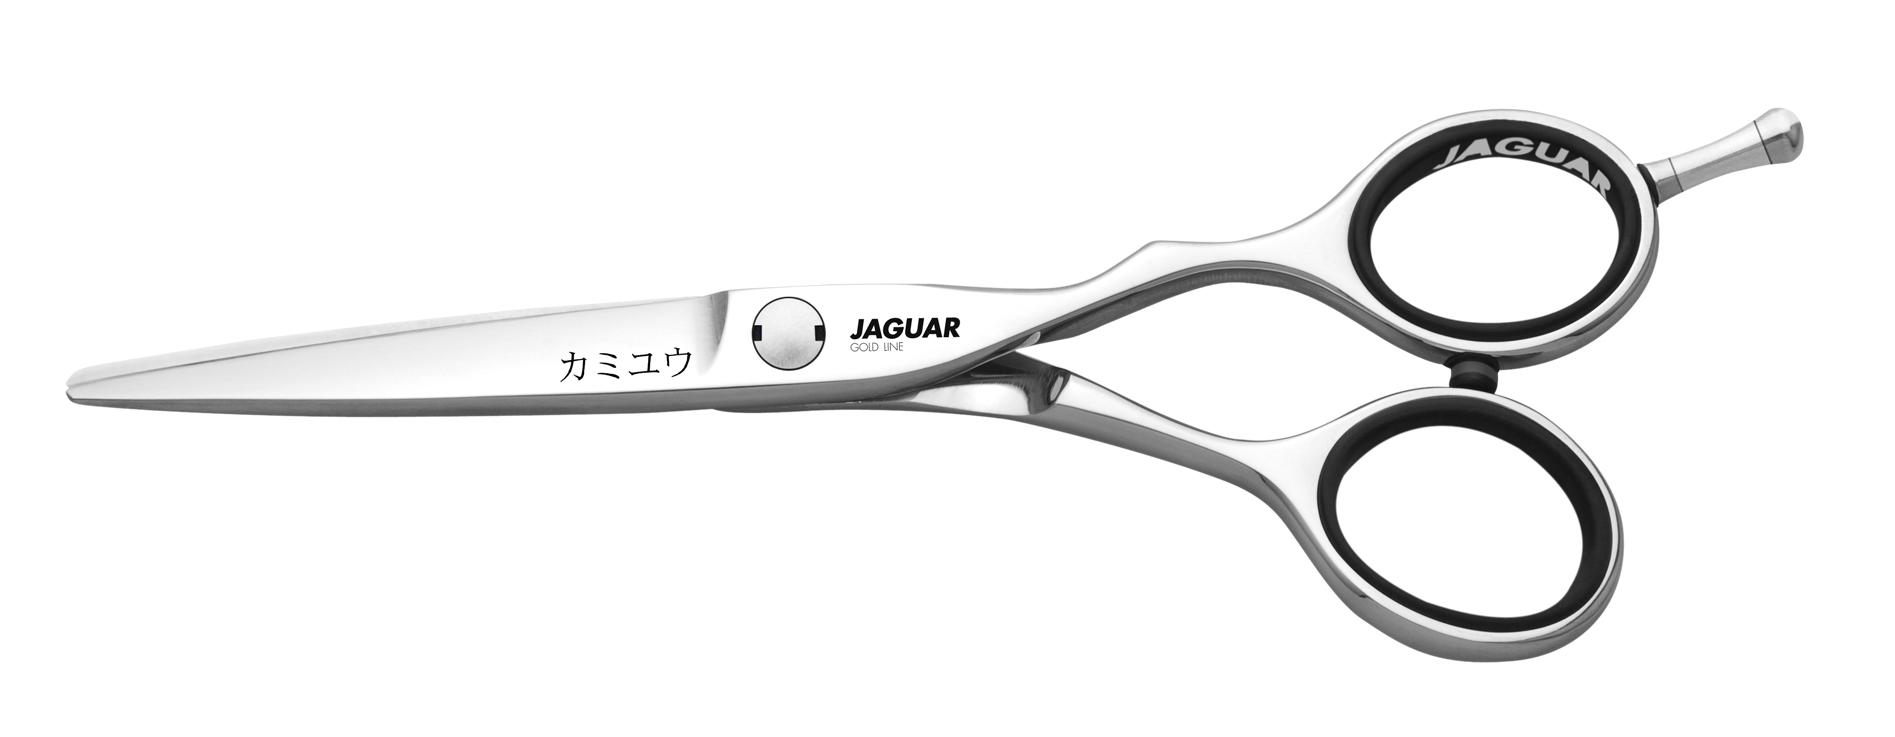 JAGUAR Ножницы Kamiyu 6.5' ****